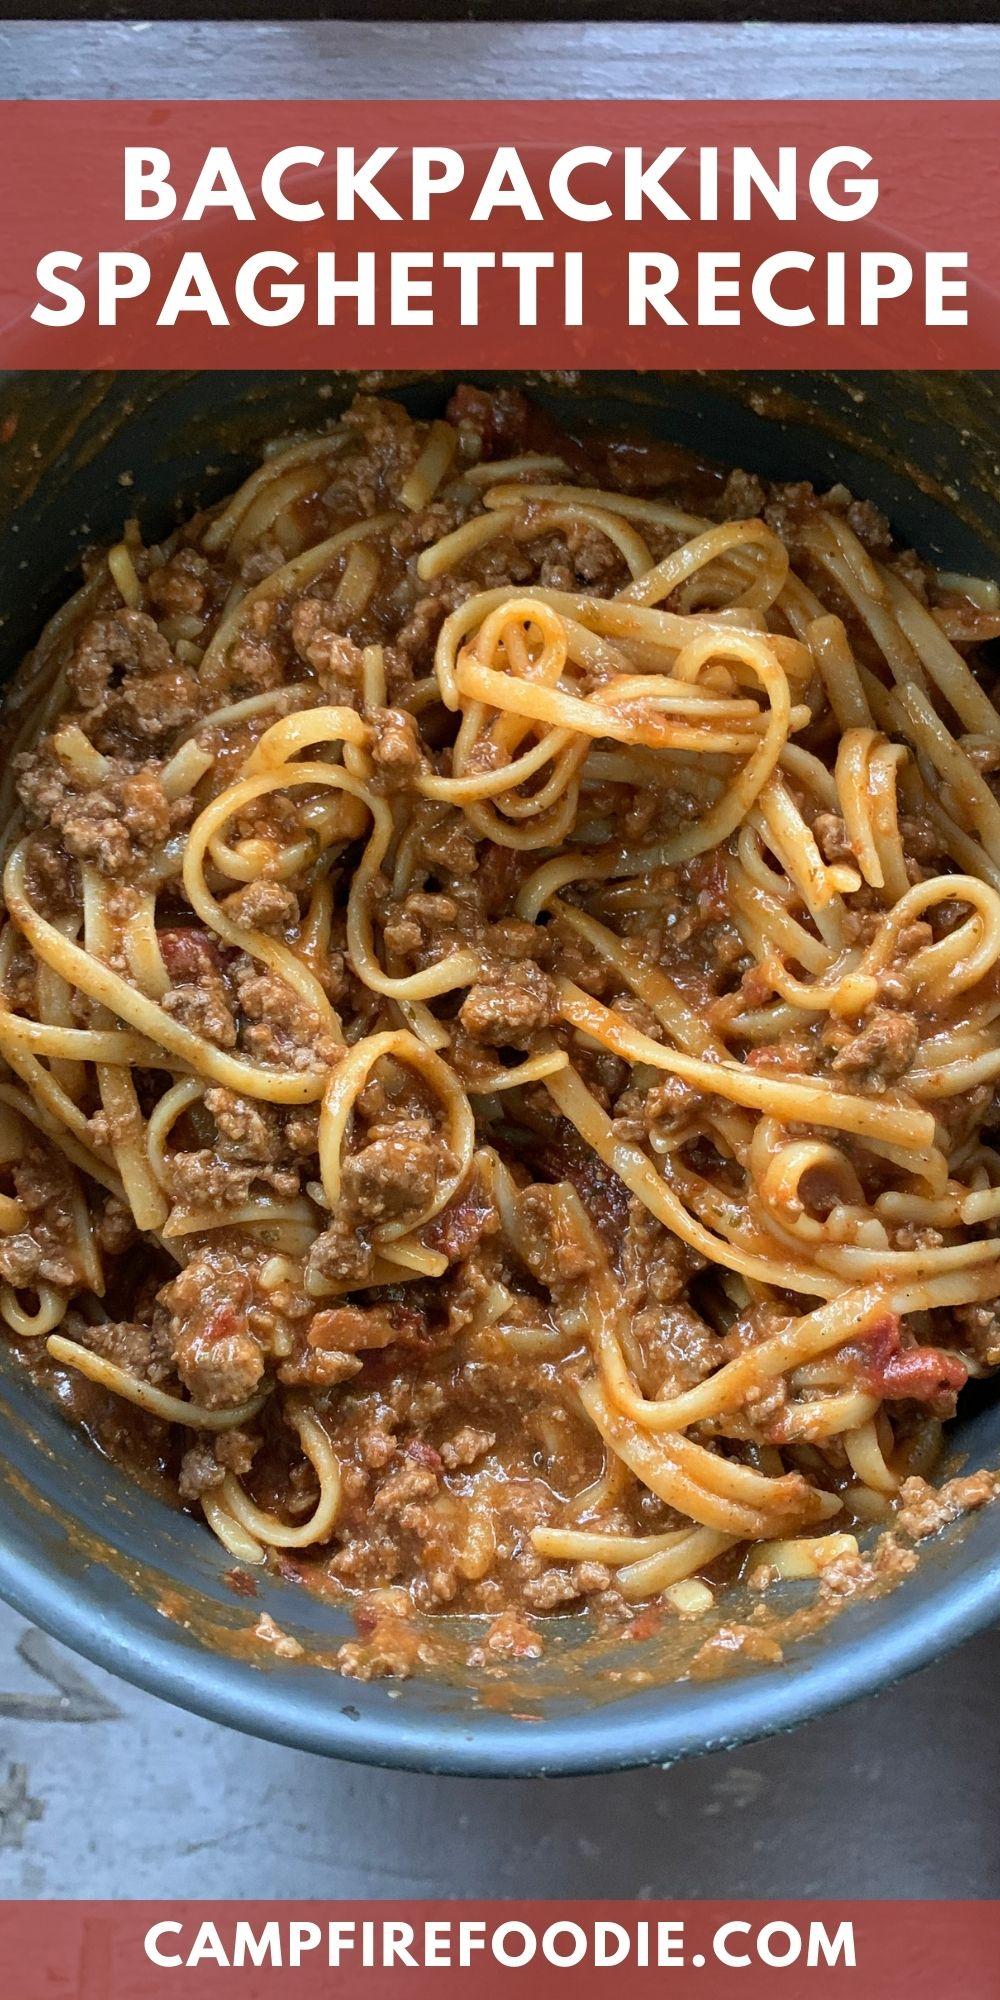 Simple Backpacking Spaghetti Recipe